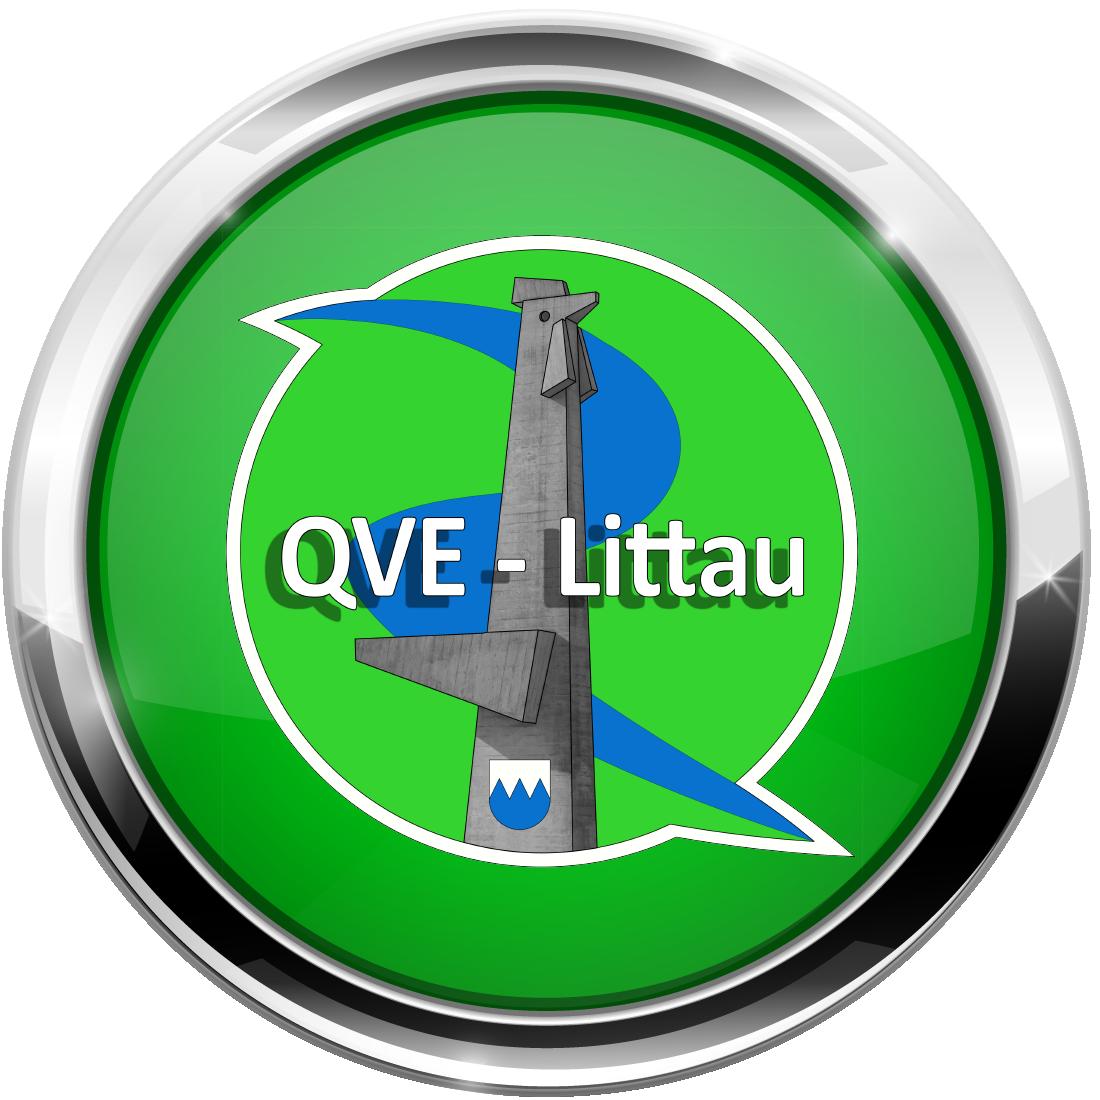 QVE-Littau